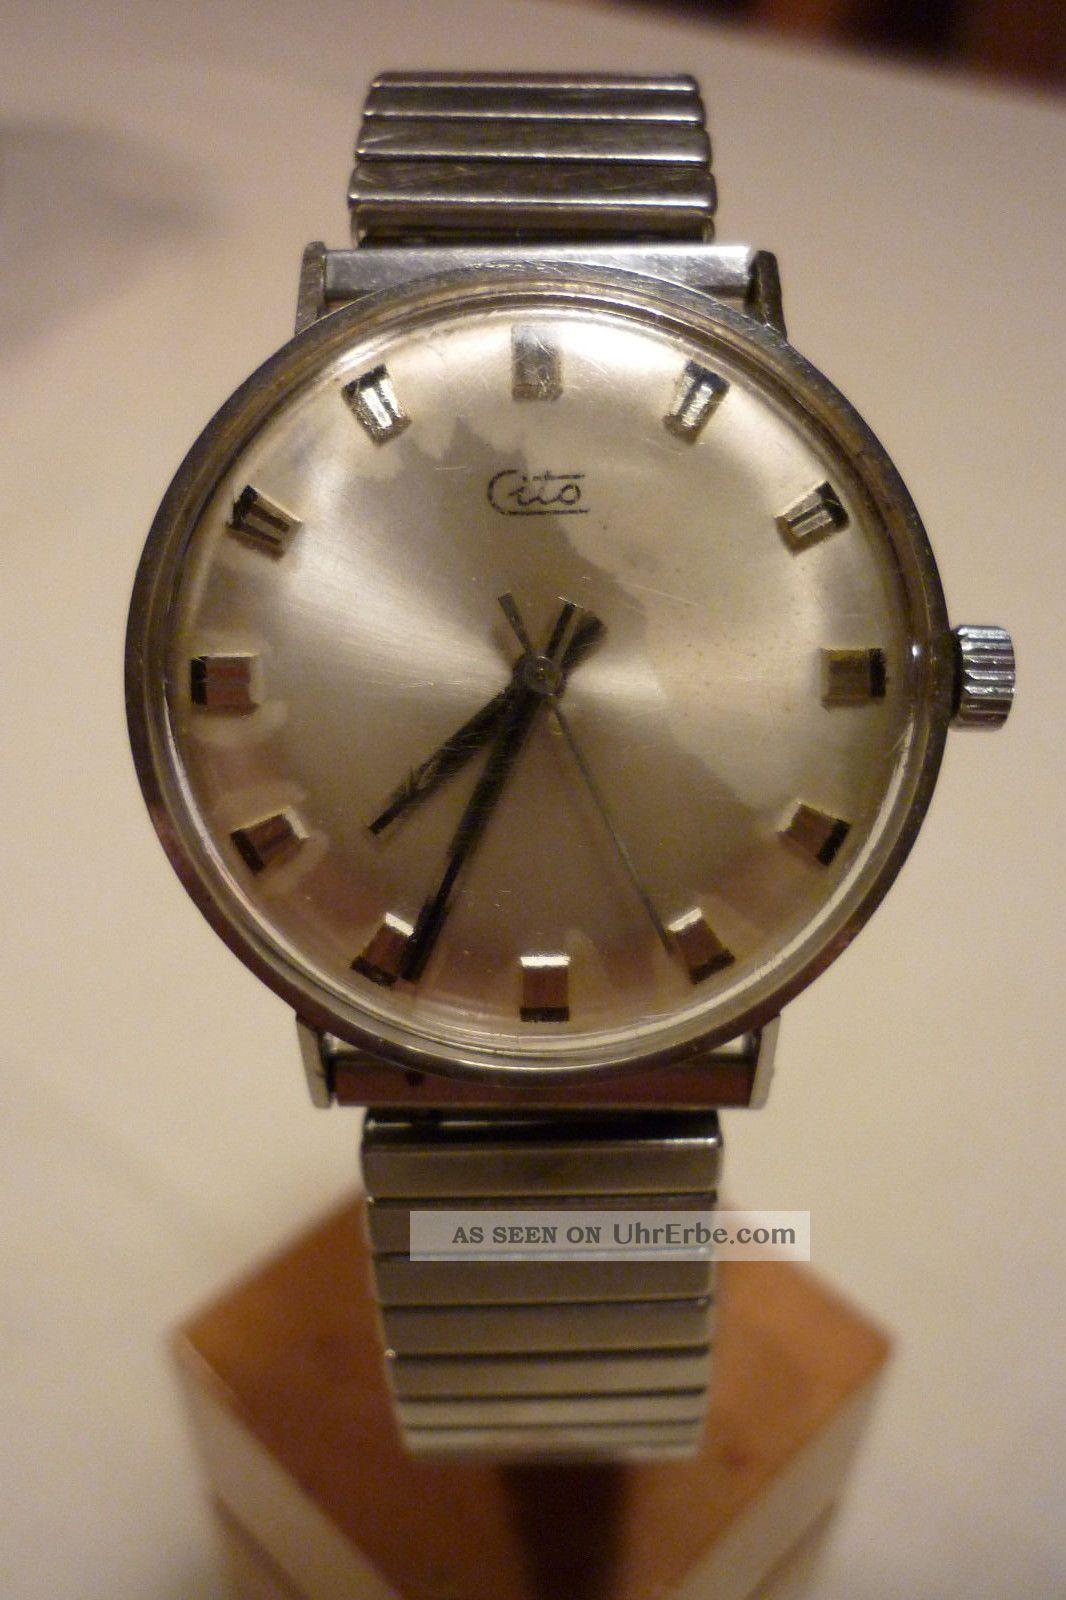 Herrenuhr Cito Mechanisch - Handaufzug Uhr Armbanduhr Armbanduhren Bild